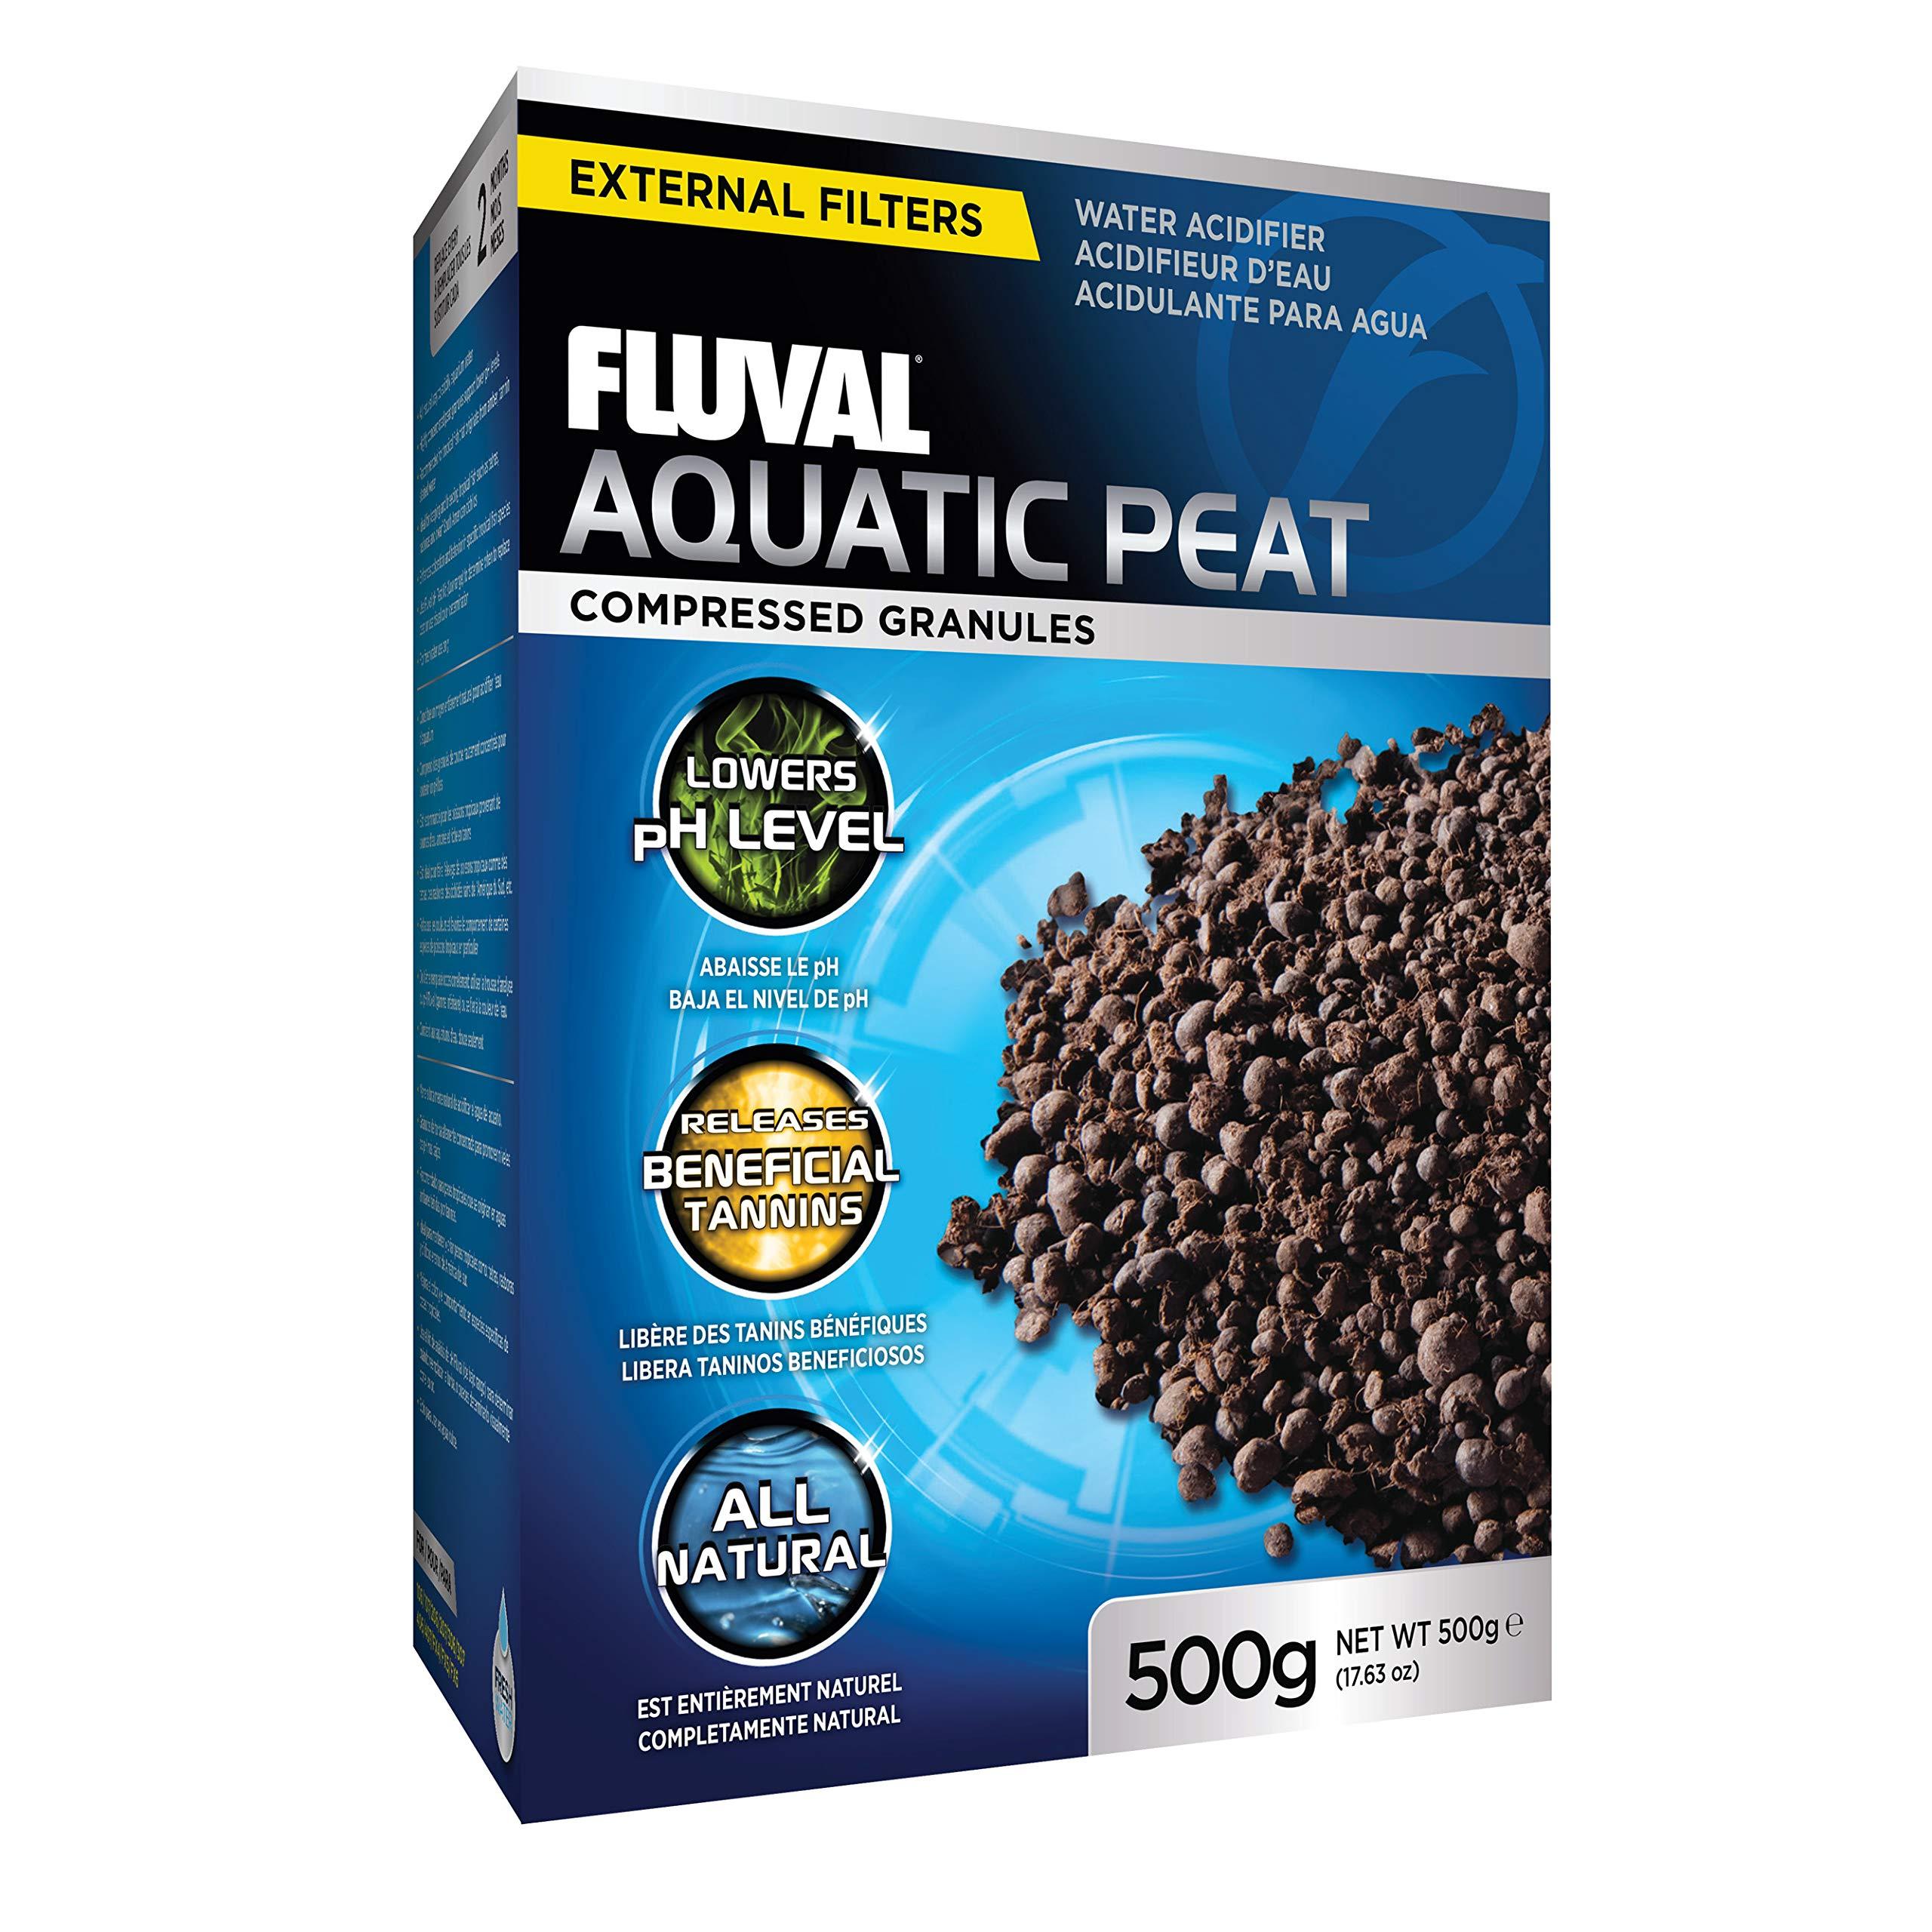 Fluval Aquatic Peat Granules, Chemical Filter Media for Freshwater Aquariums, Water Softener, 17.6 oz., A1465